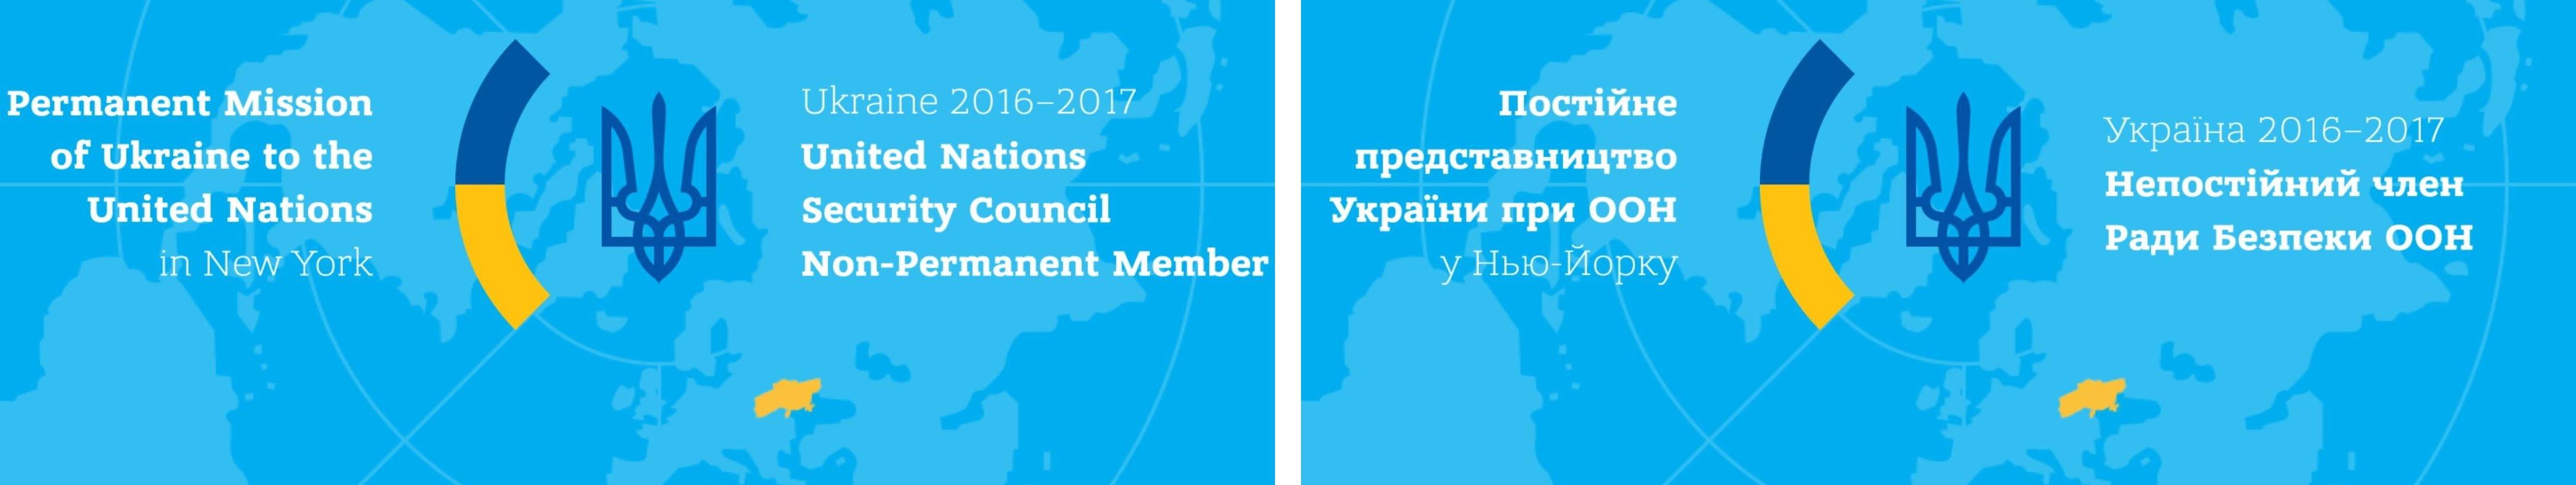 Russian Aggression against Ukraine | Російська агресія проти України